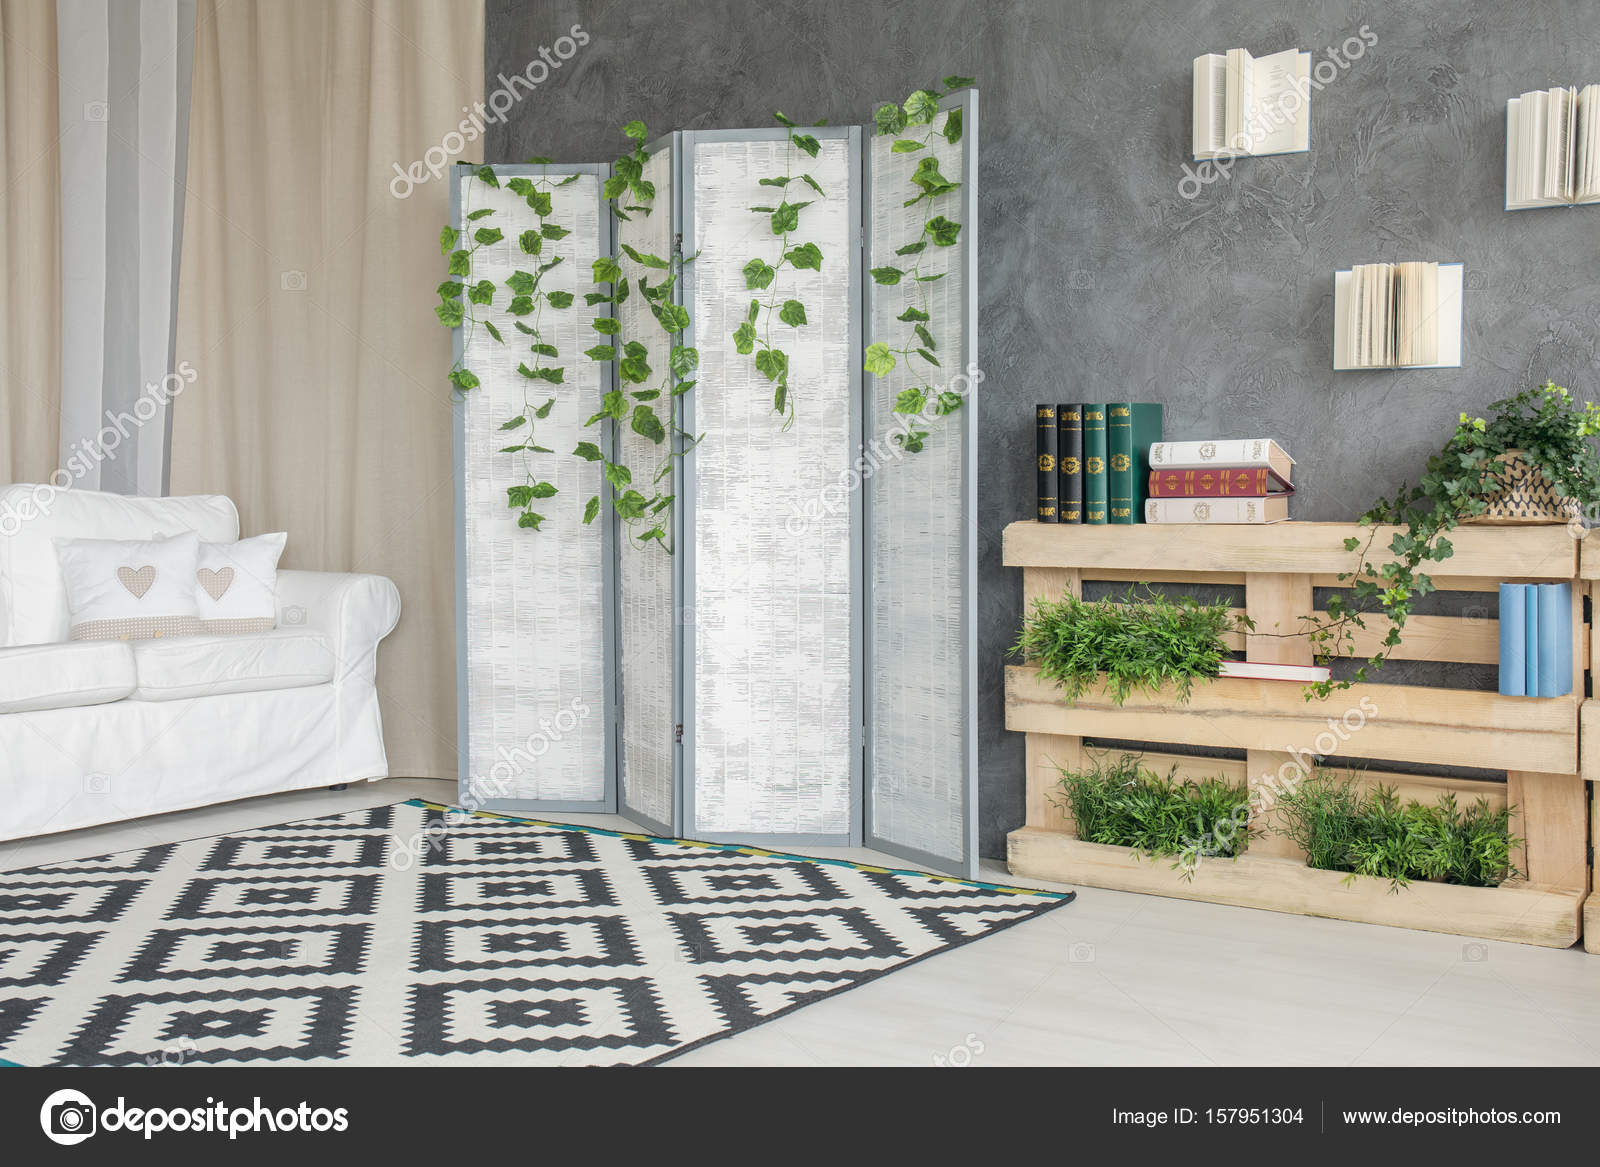 Zimmer Mit Raumteiler Stockfoto Photographeeeu 157951304